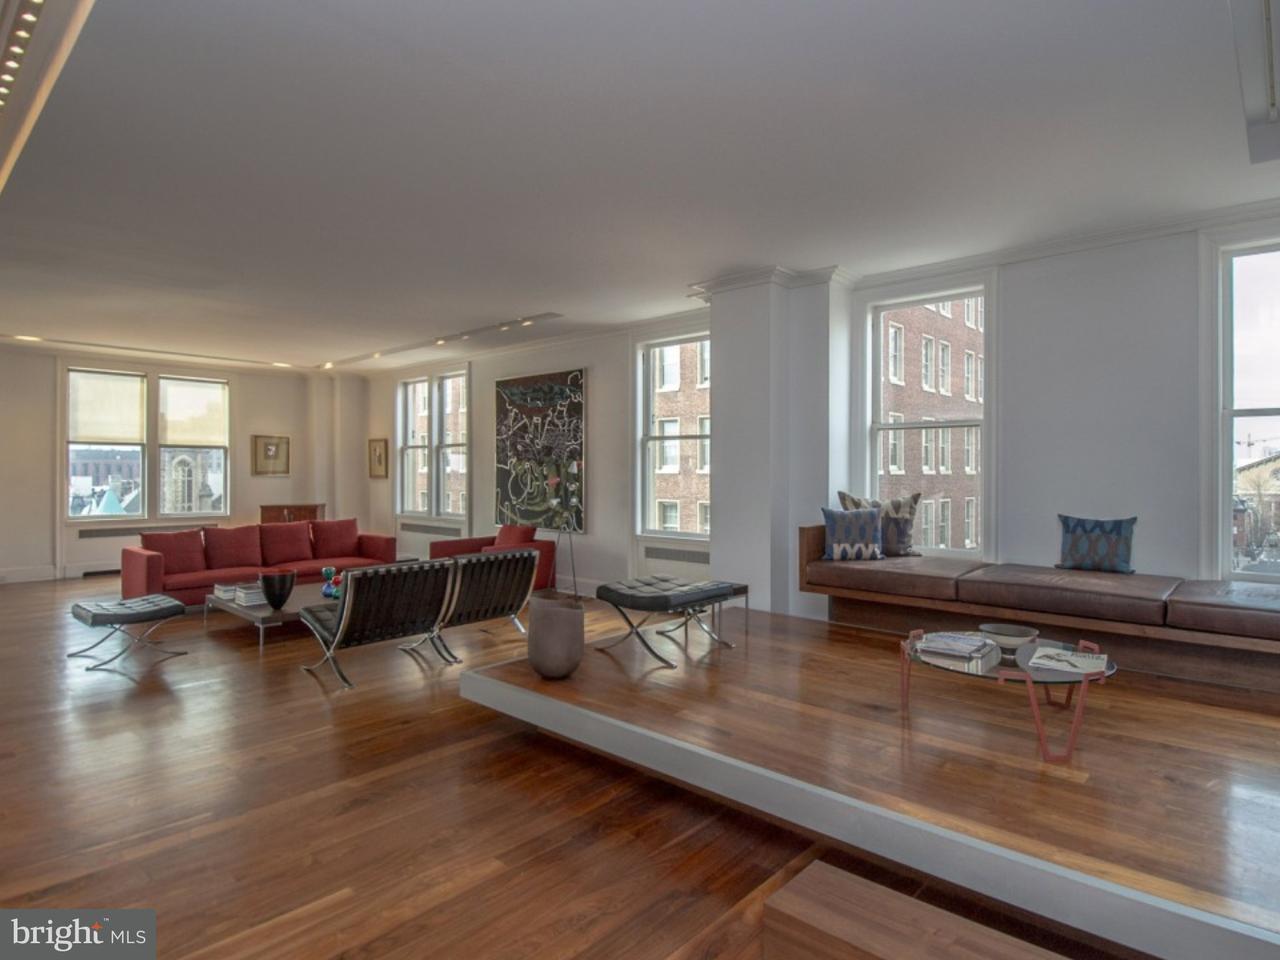 Additional photo for property listing at 237 S 18TH ST #6A&6B  Philadelphia, Pennsylvanie 19103 États-Unis